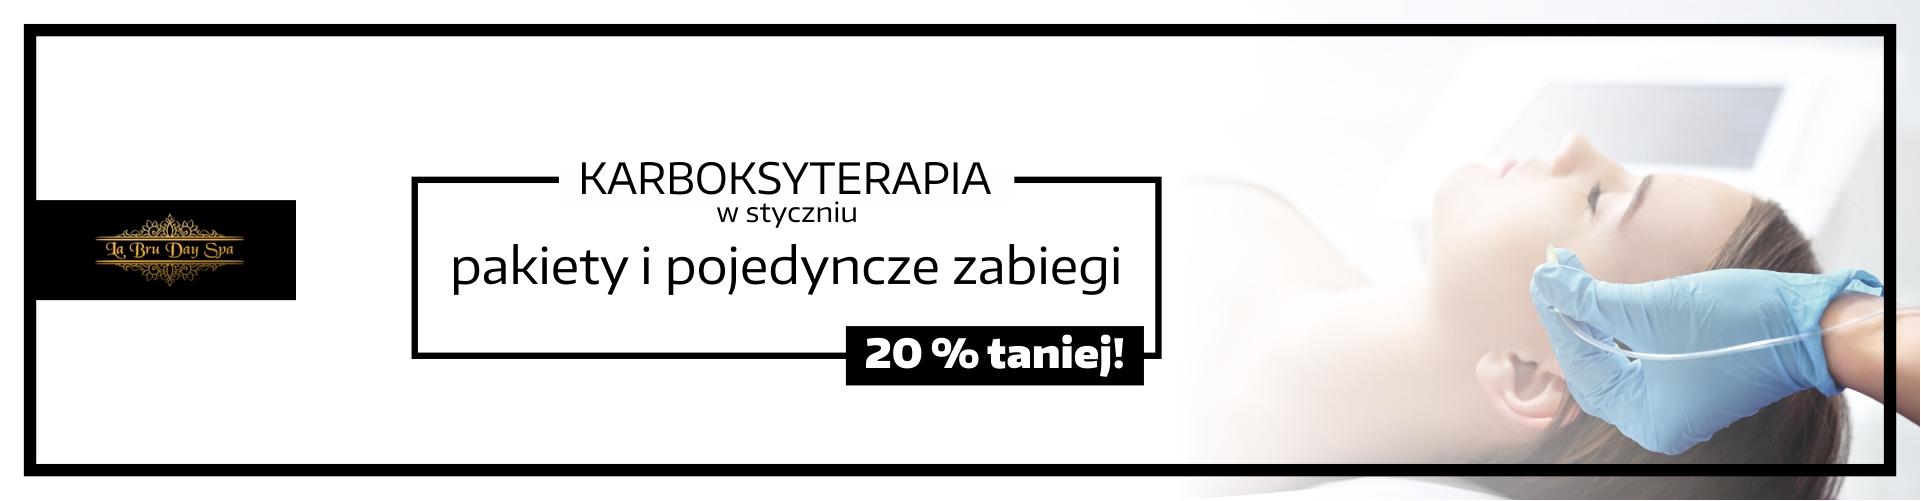 karboksyterapia_styczen